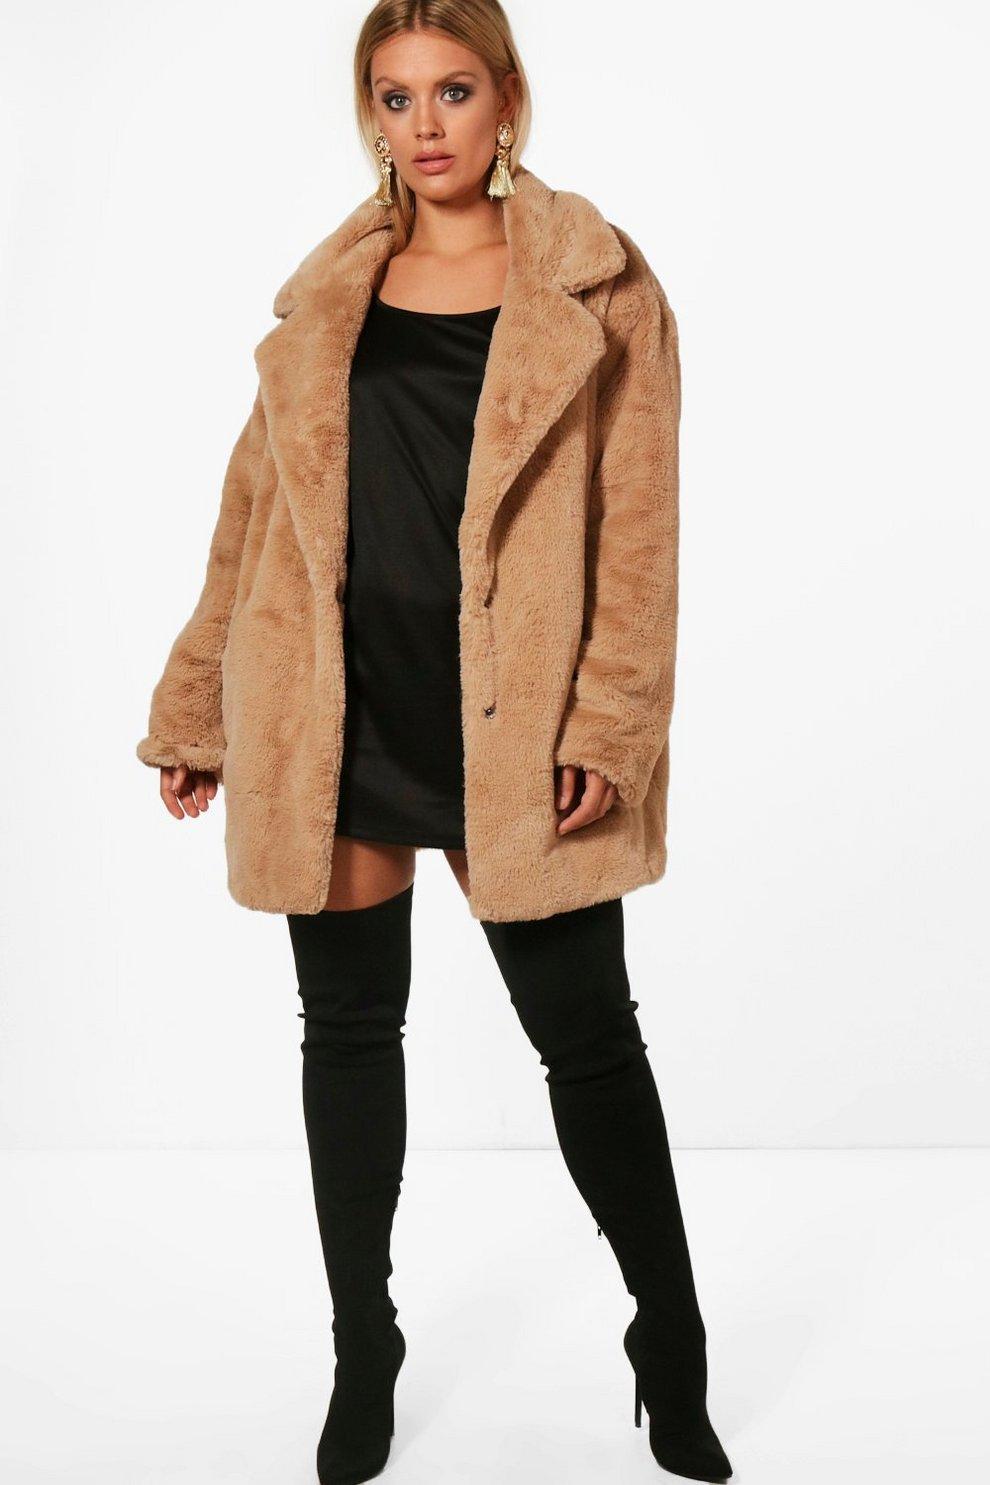 Manteau teddy femme fausse fourrure